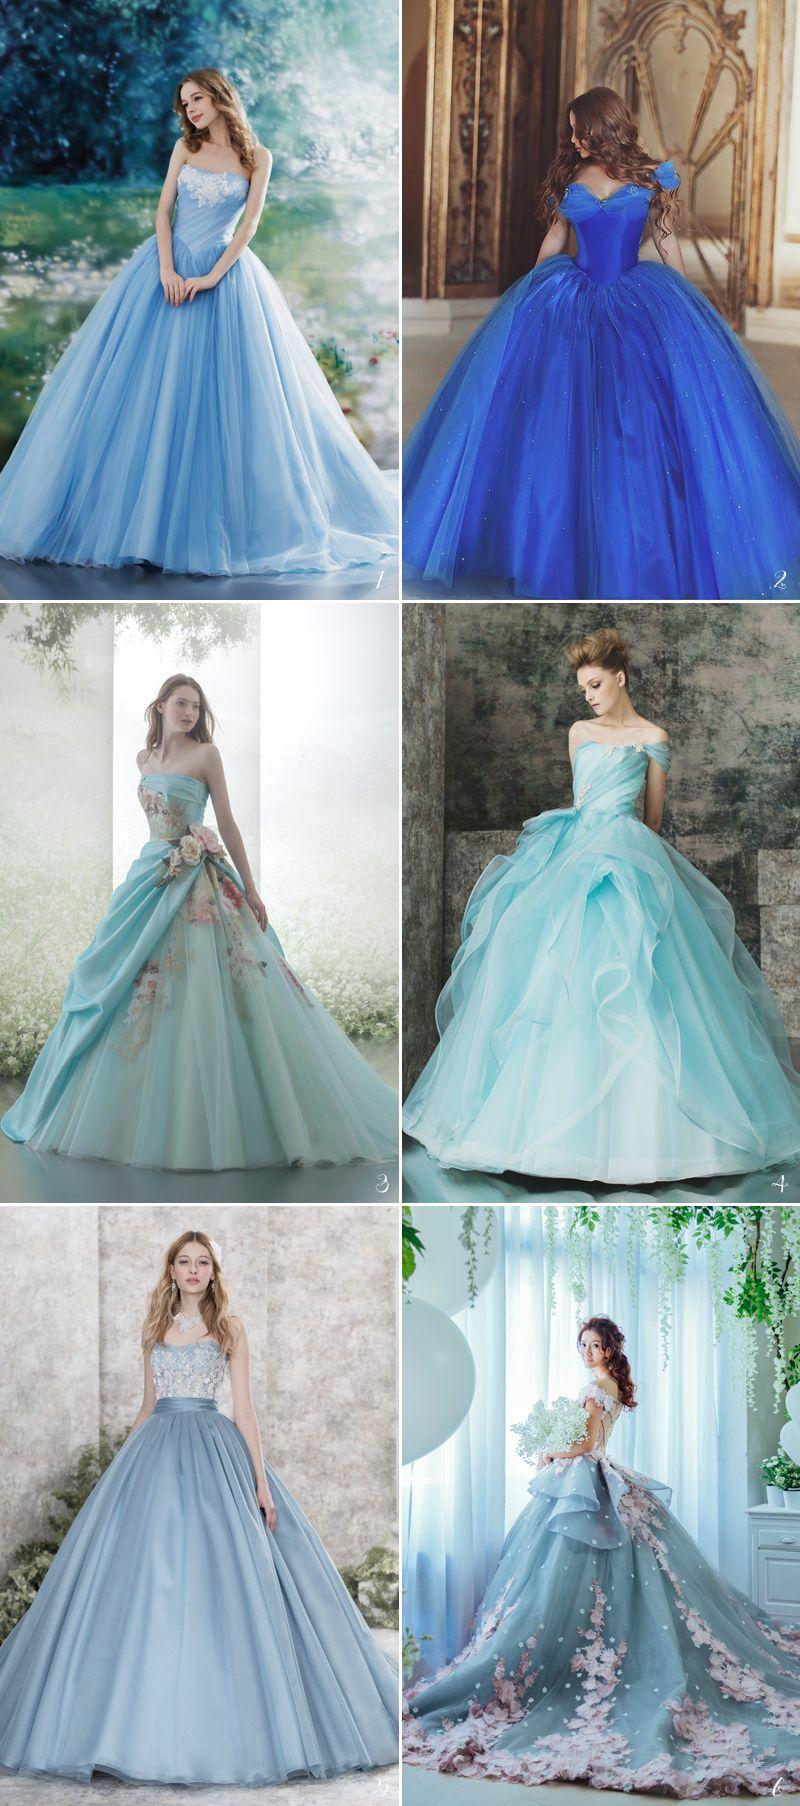 Pin By Juliana Zambrano On Ball Gowns Fairy Tale Wedding Dress Princess Wedding Dresses Gowns [ 1806 x 800 Pixel ]